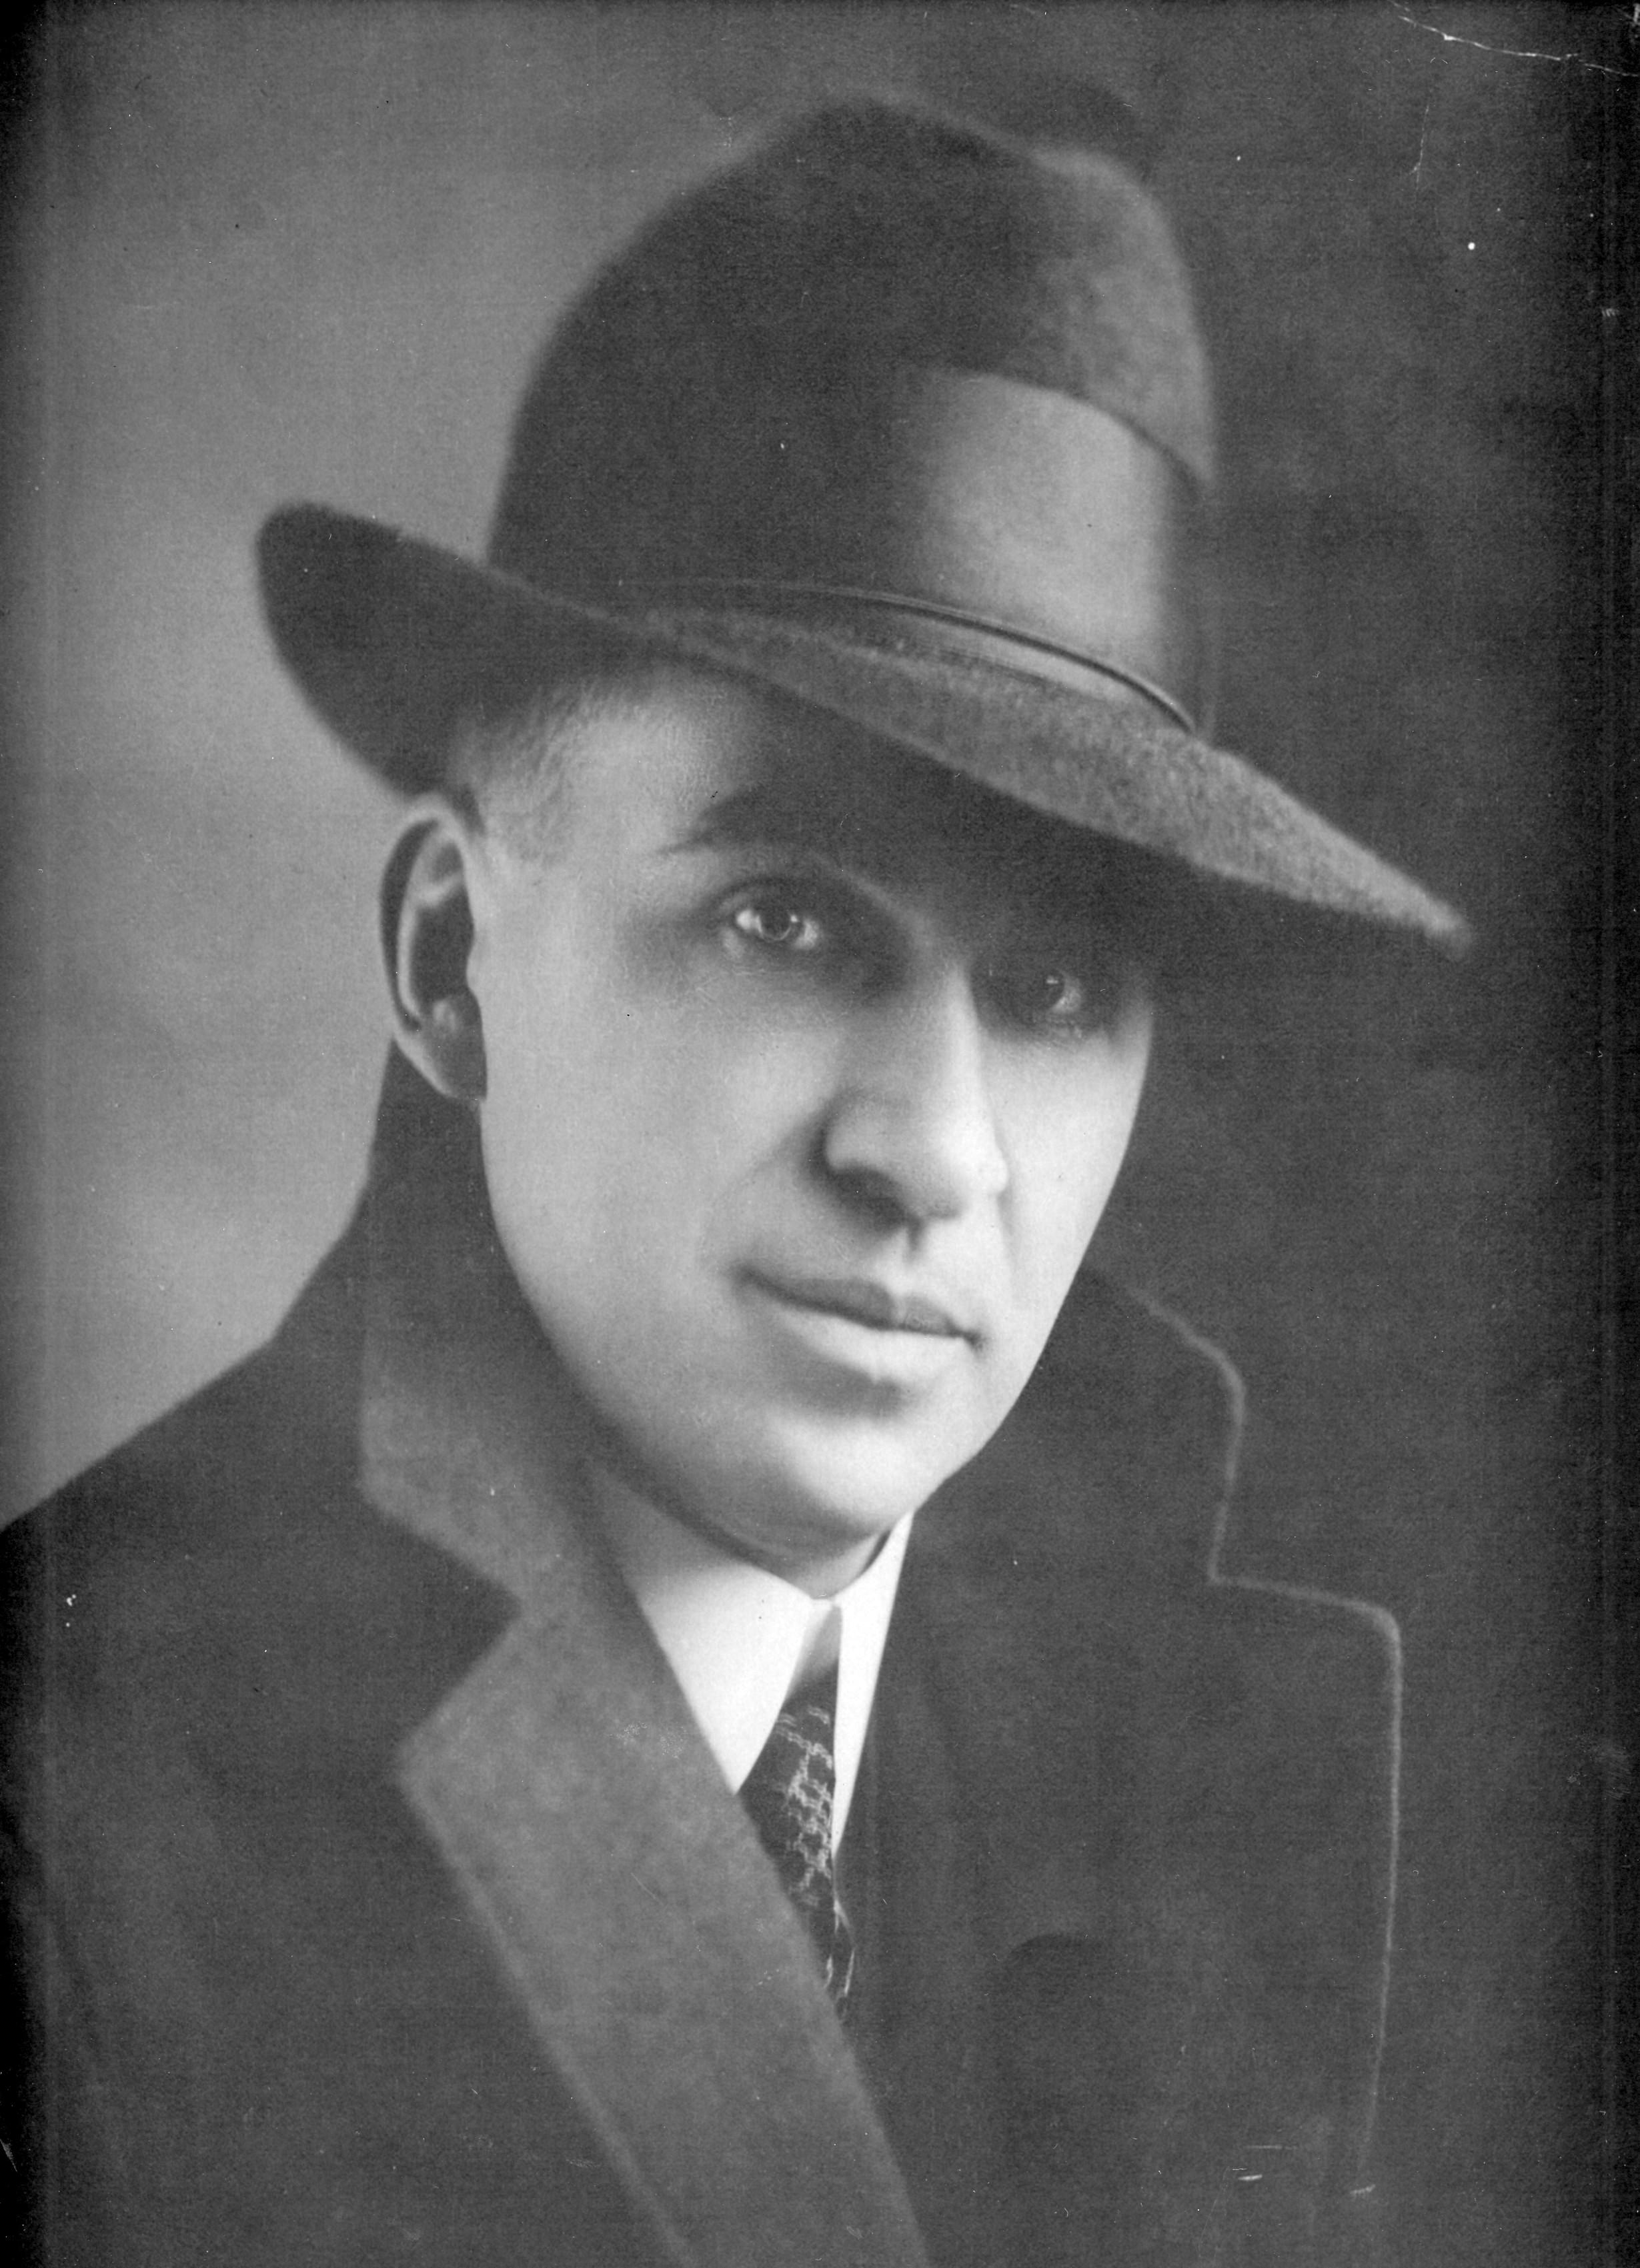 Ballif, Serge Frederick, Jr.